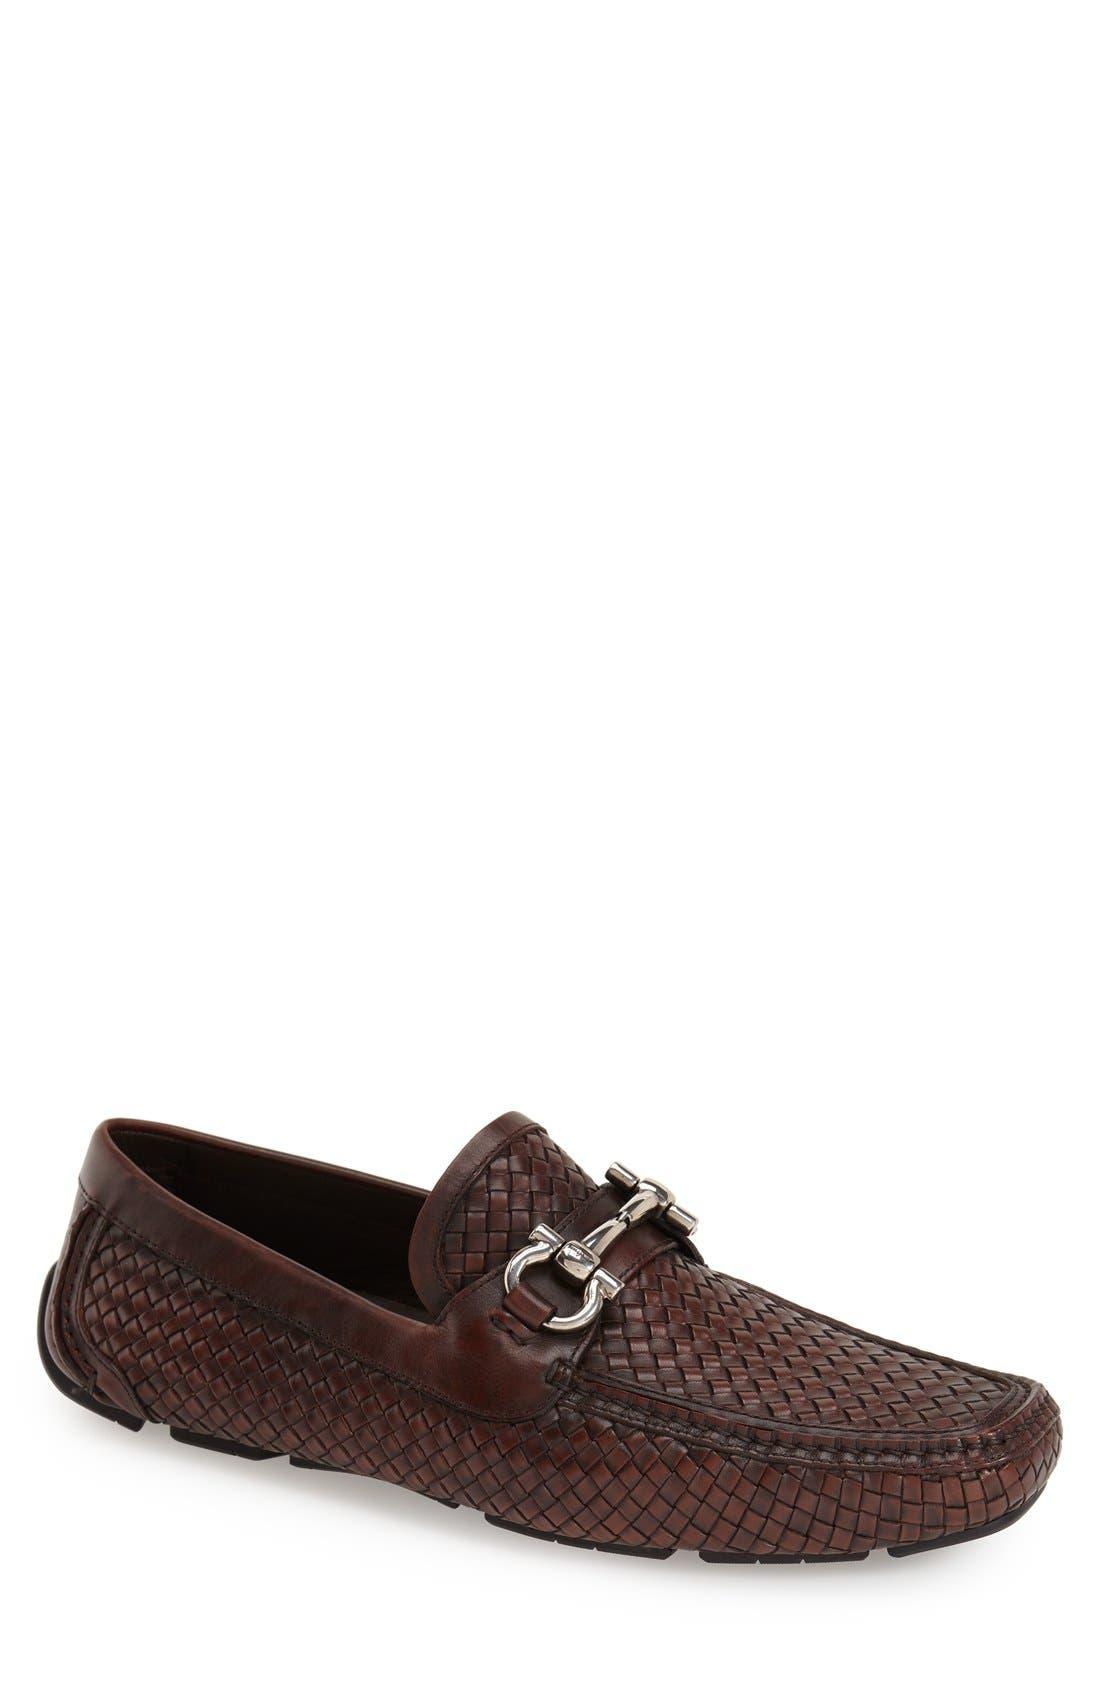 'Parigi' Woven Bit Loafer,                             Main thumbnail 1, color,                             Brown Hen/ T Moro Leather